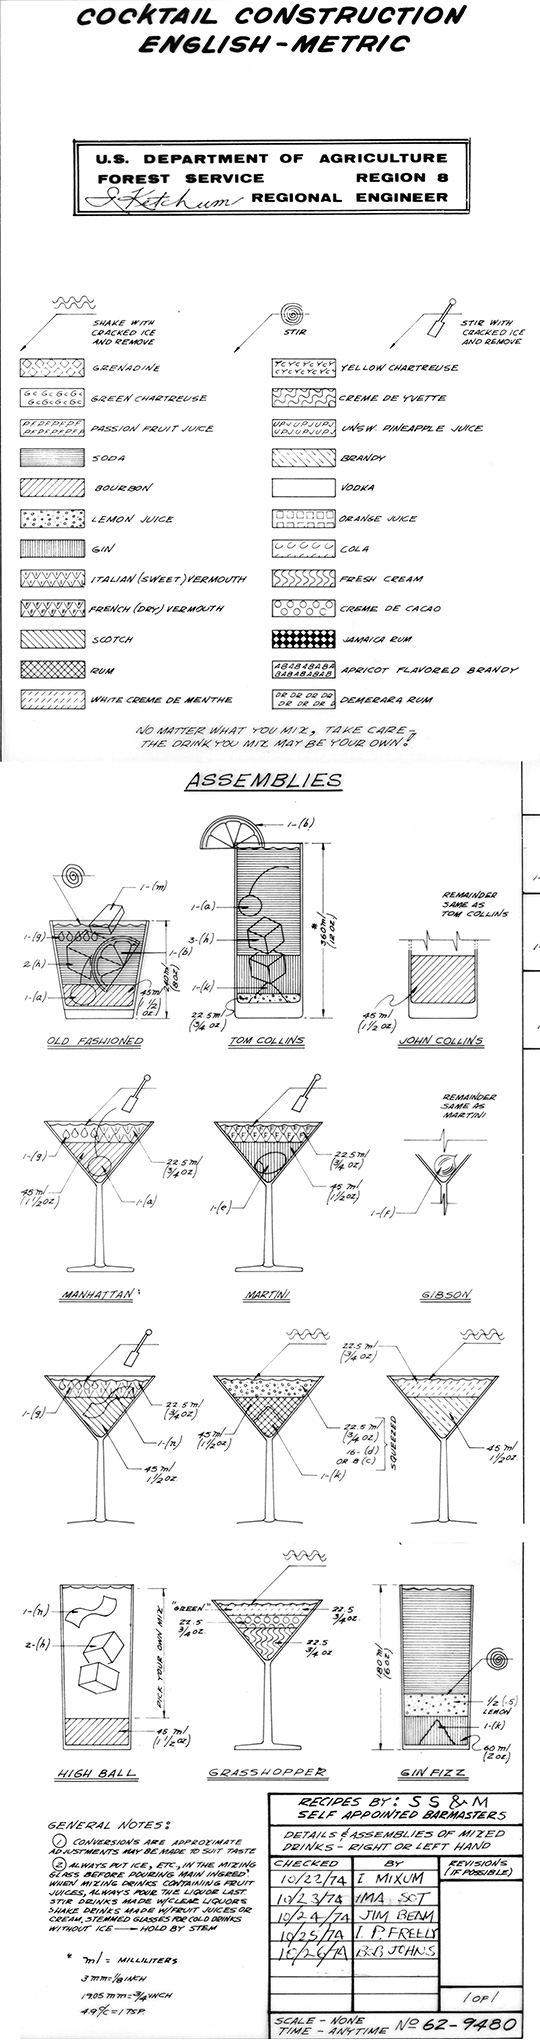 forest service cocktail blueprint